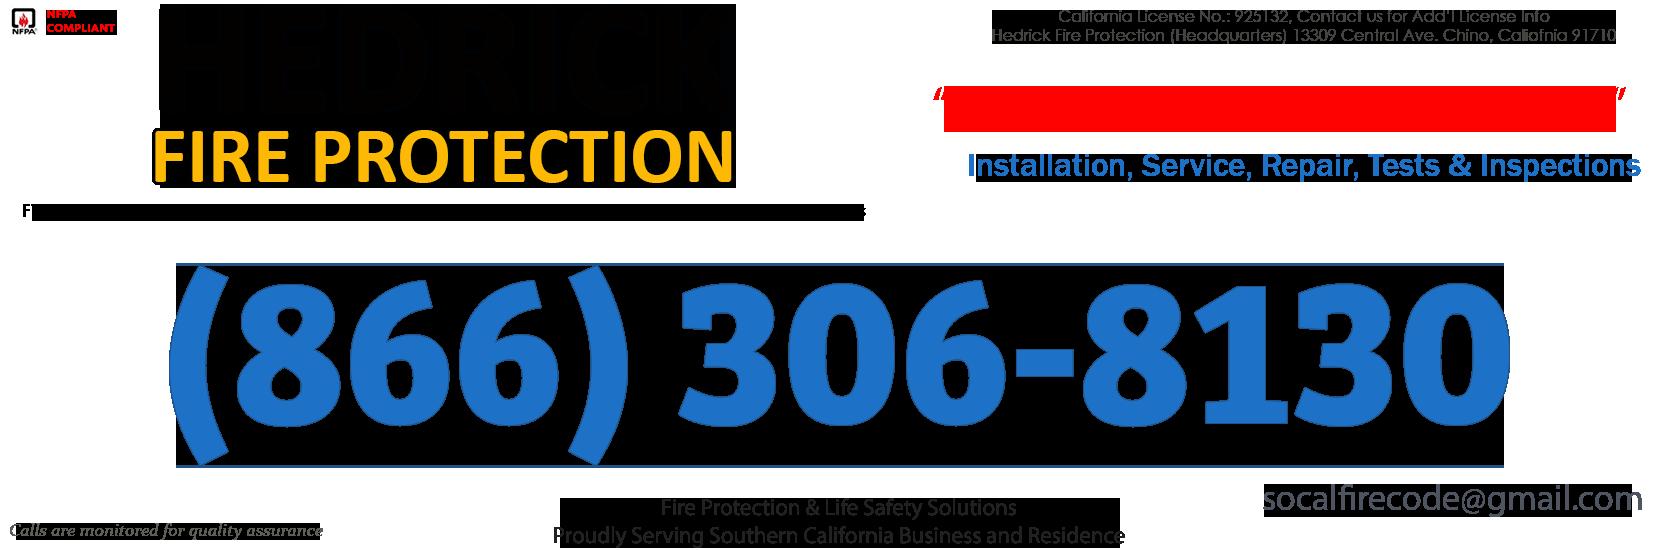 Camarillo, California Fire Sprinkler Service Company